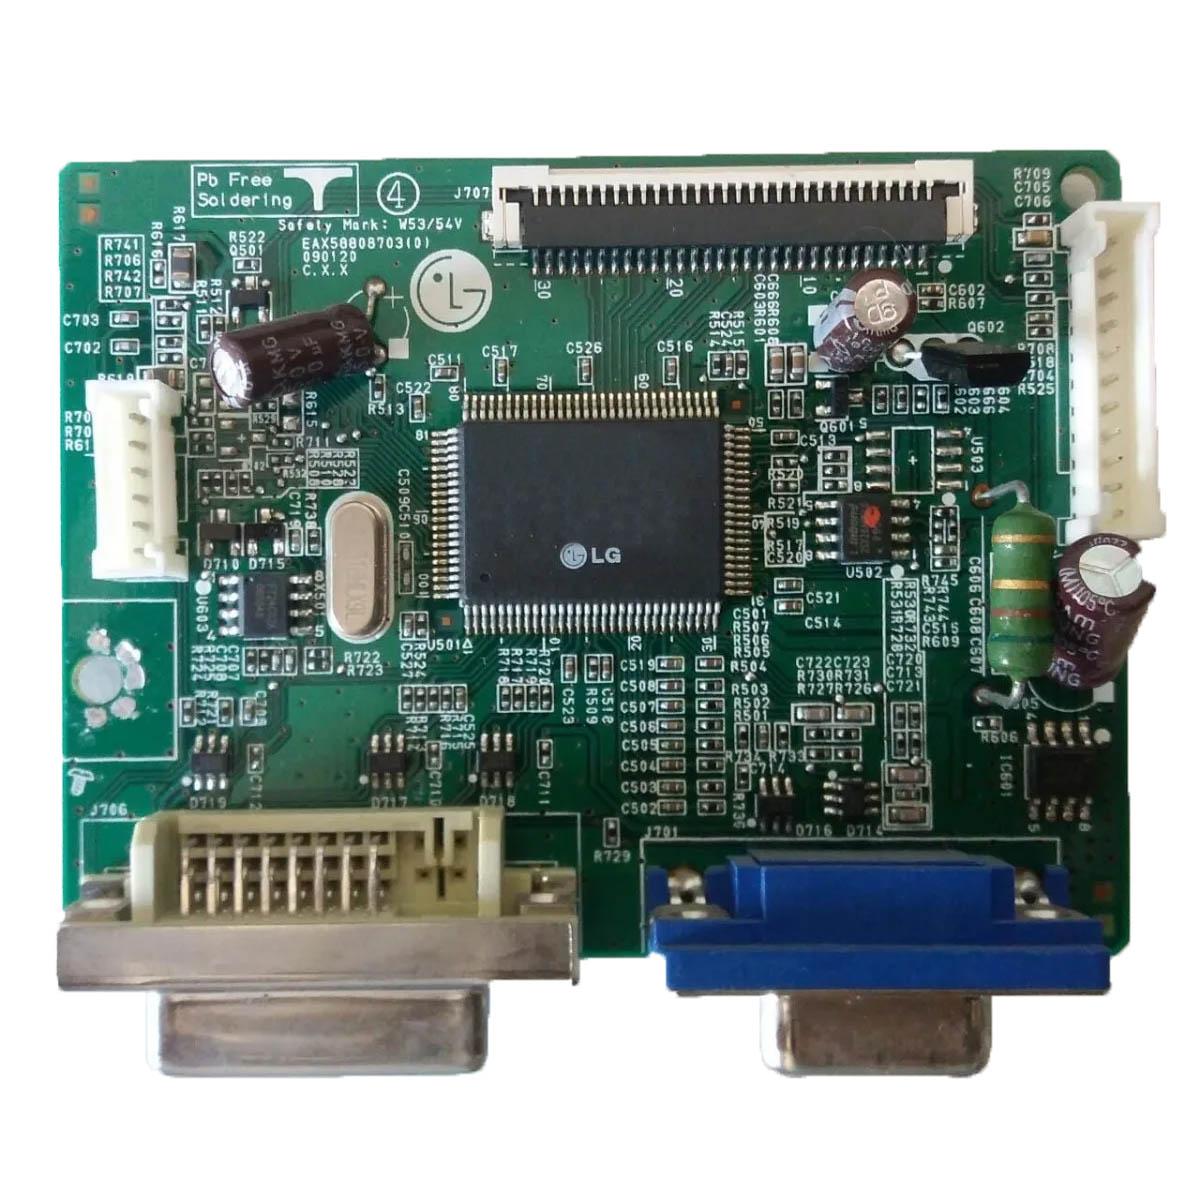 Placa Lógica Monitor LG W1953tc Pf PN:Eax58808703 (0) - Retirado